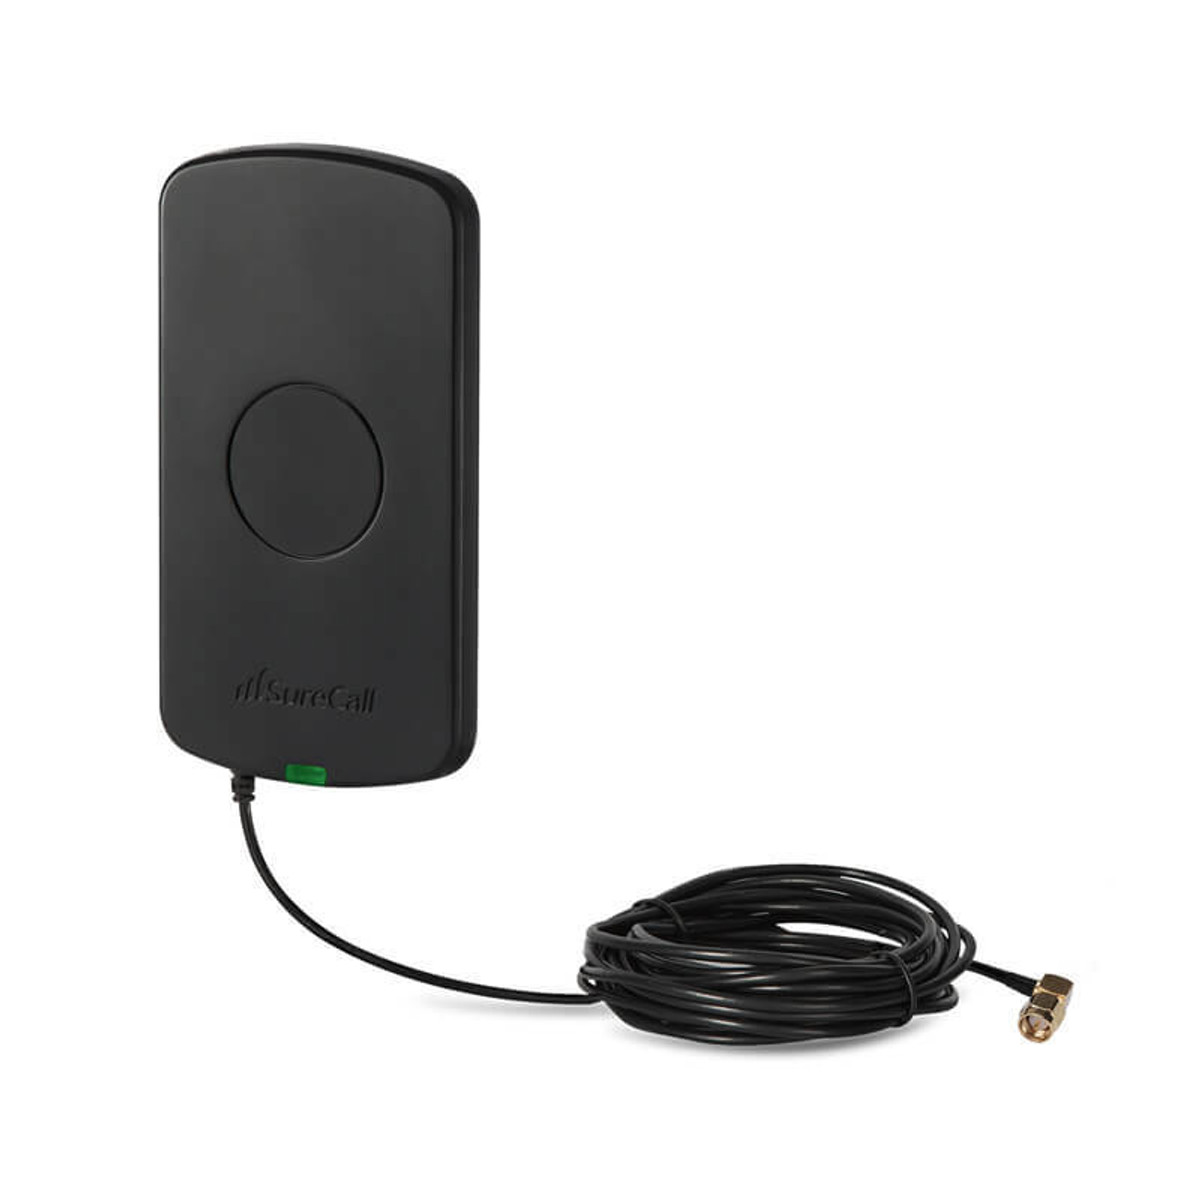 SureCall SureCall FusionTrek Cell Phone Signal Booster Kit